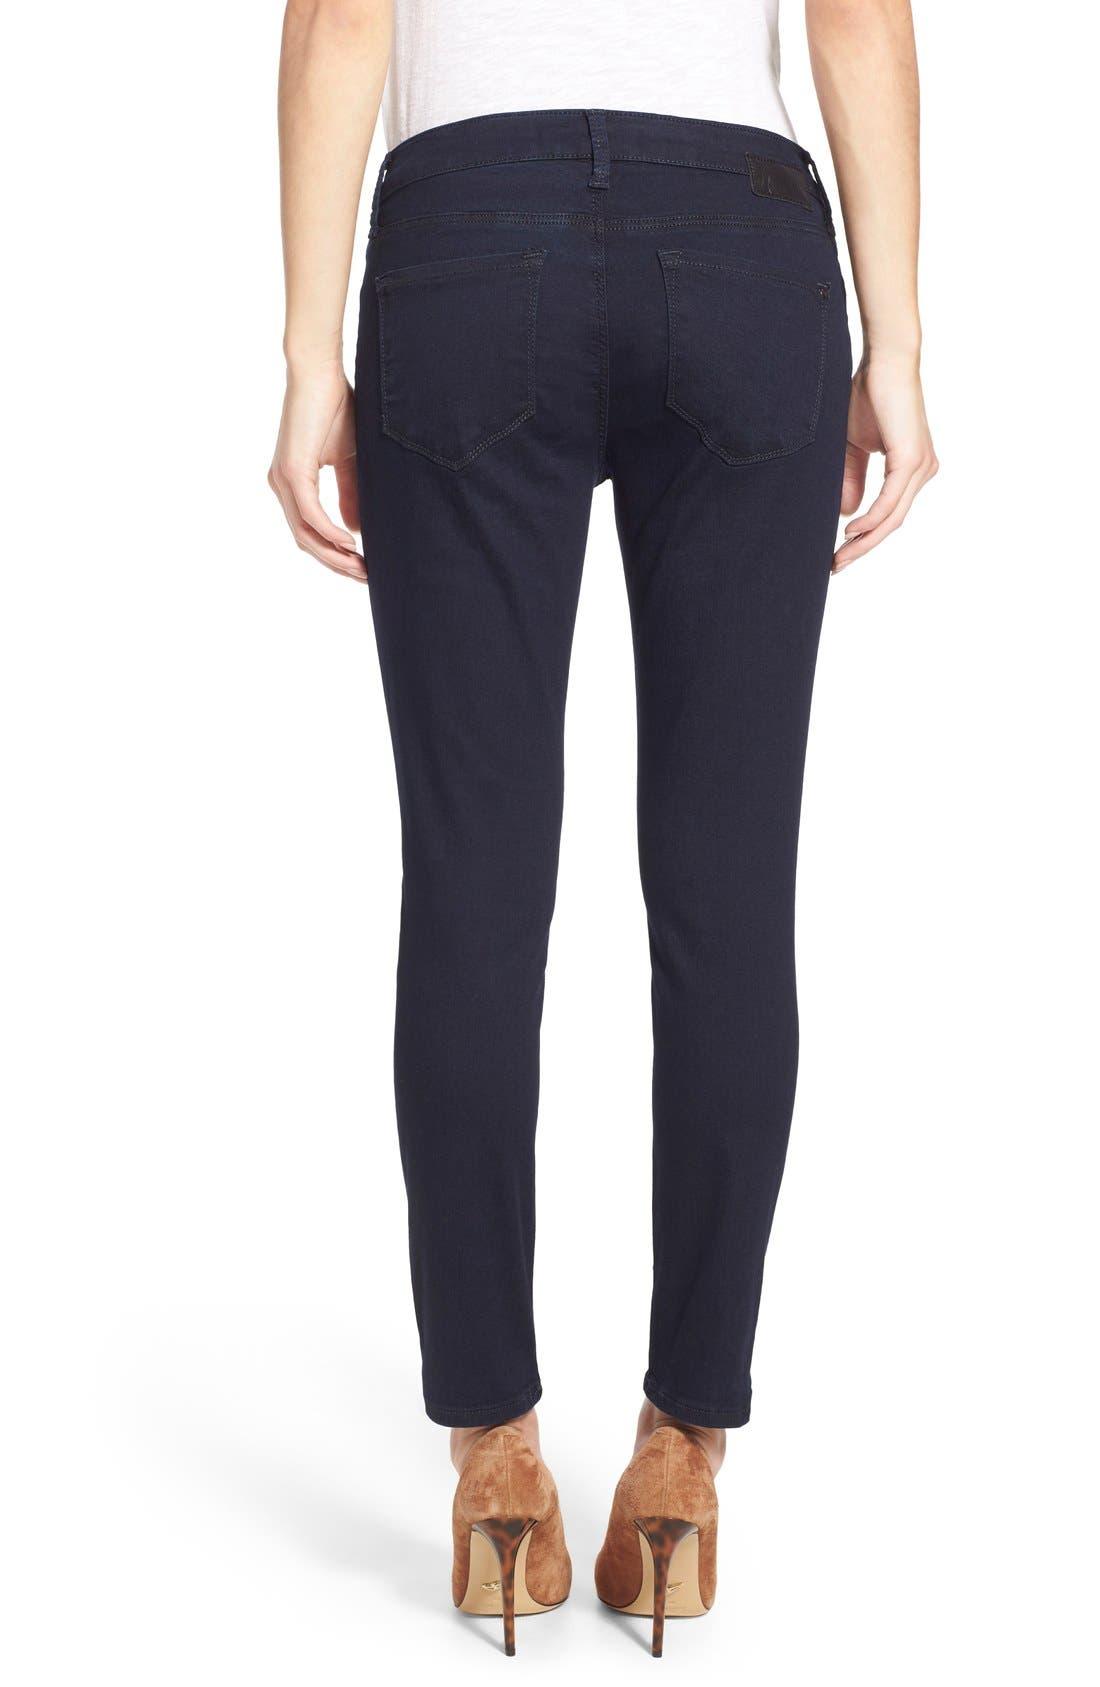 Alternate Image 2  - Mavi Jeans 'Alexa' Stretch Skinny Jeans (Dark Shanti) (Petite)